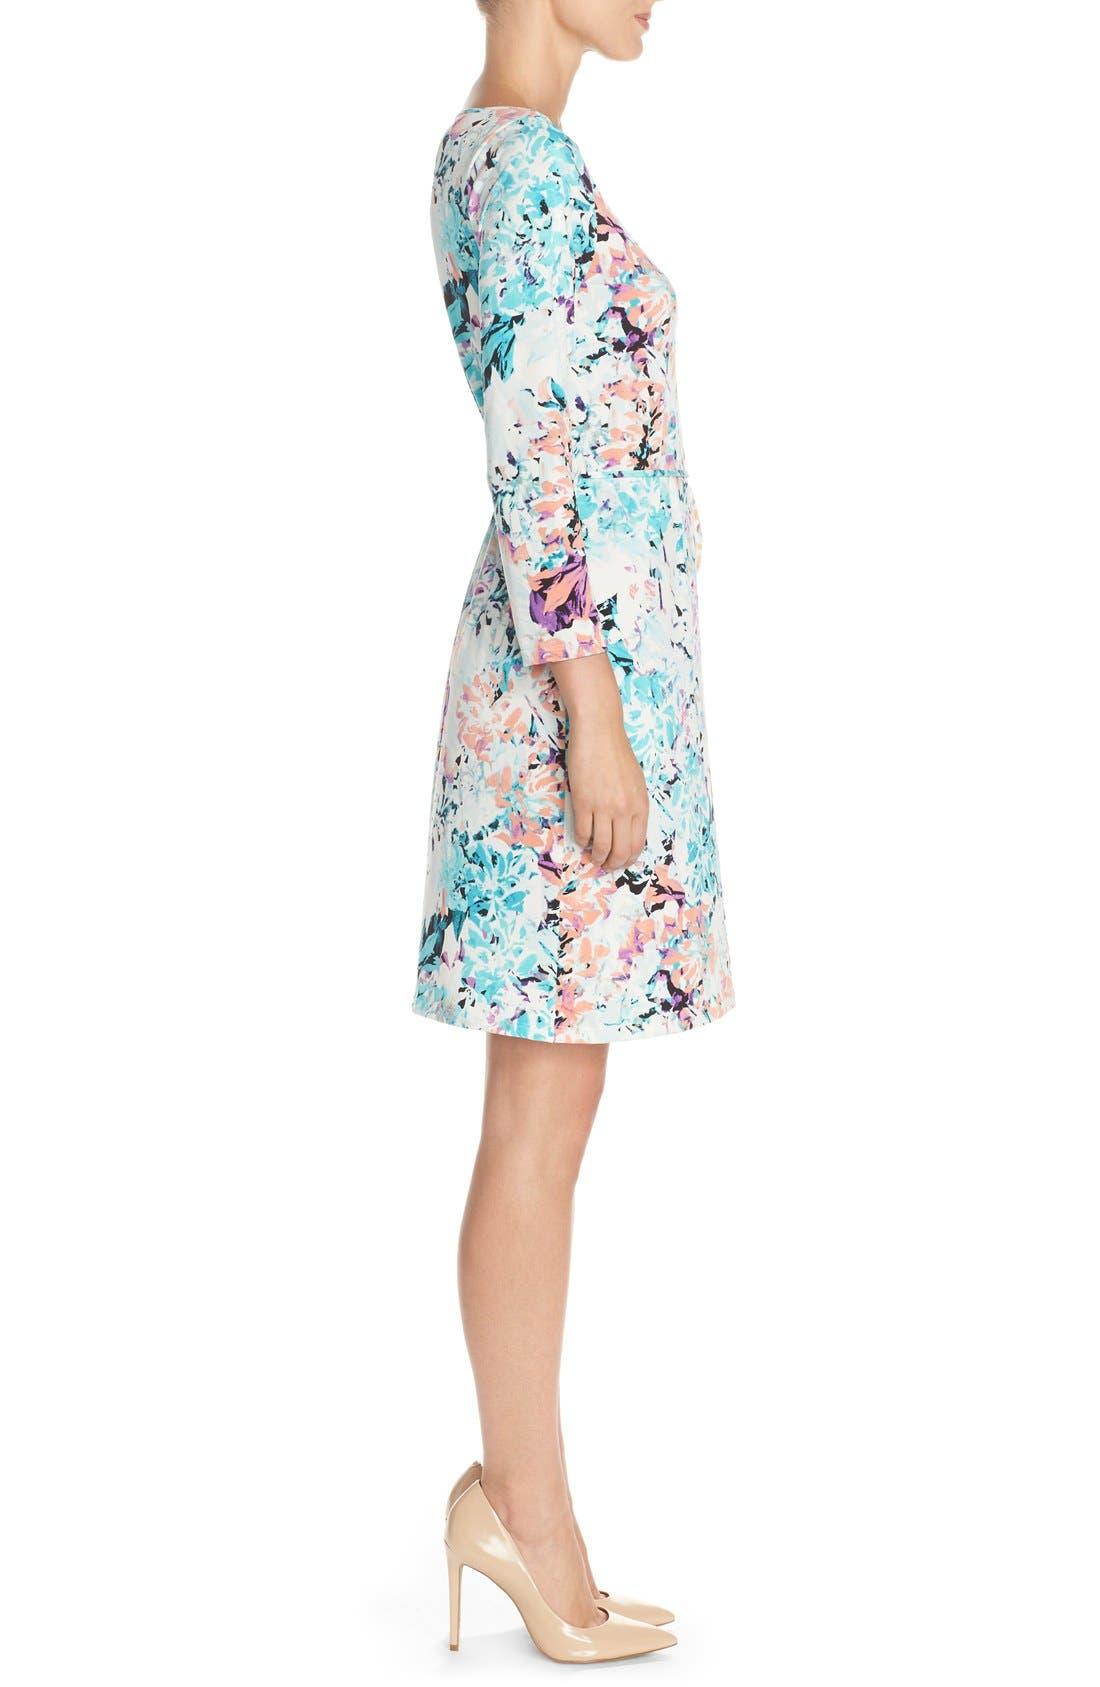 IVANKA TRUMP, Floral Print Jersey A-Line Dress, Alternate thumbnail 5, color, 101